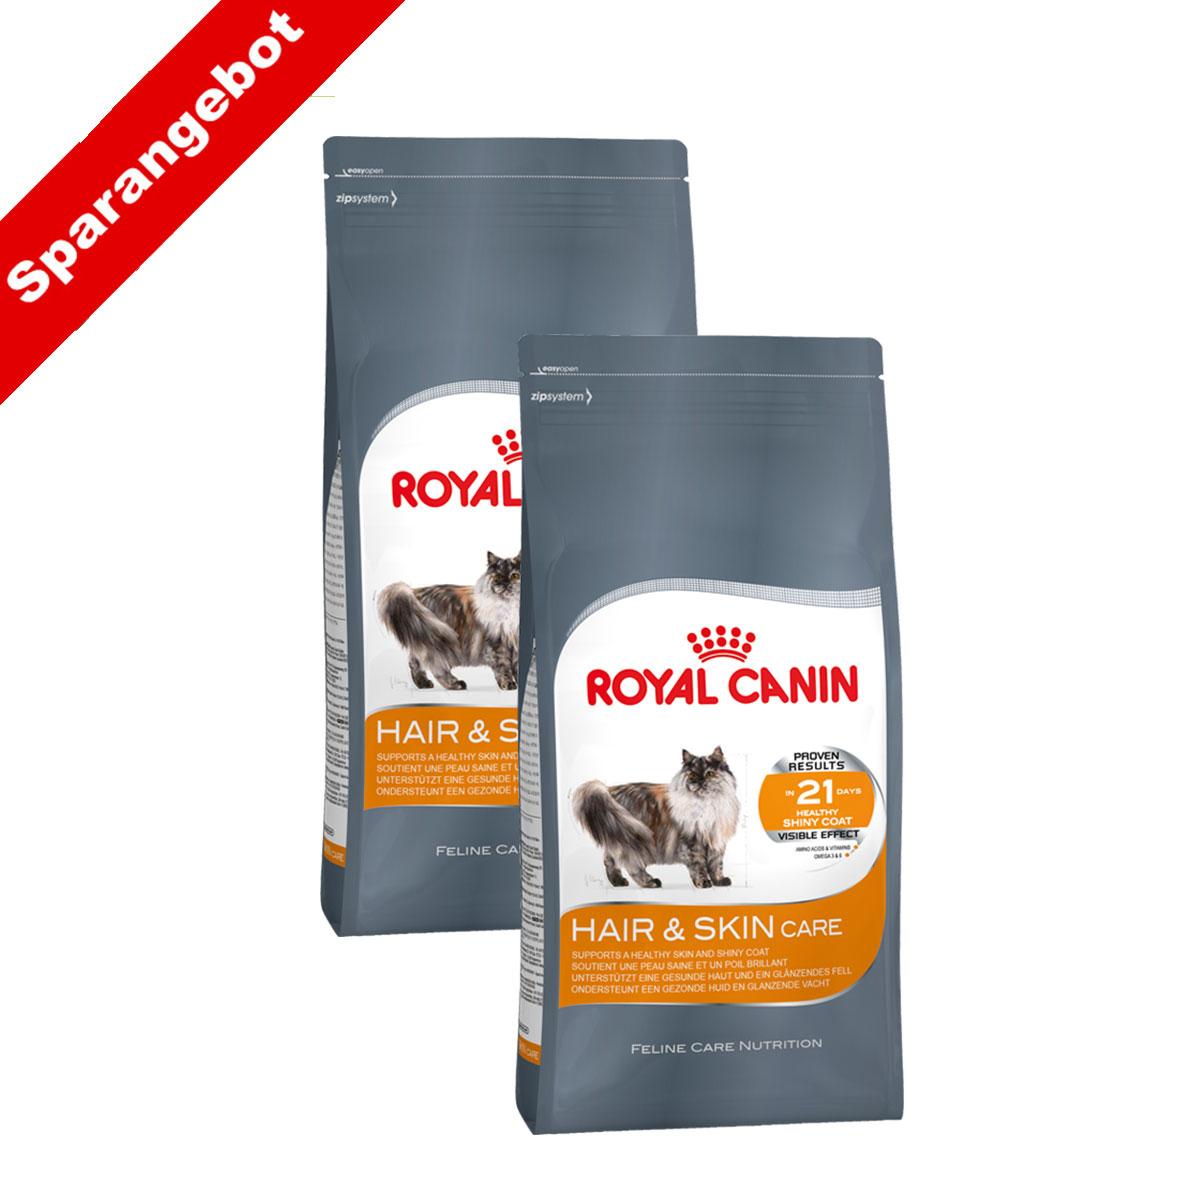 royal canin hair skin care g nstig kaufen bei zooroyal. Black Bedroom Furniture Sets. Home Design Ideas